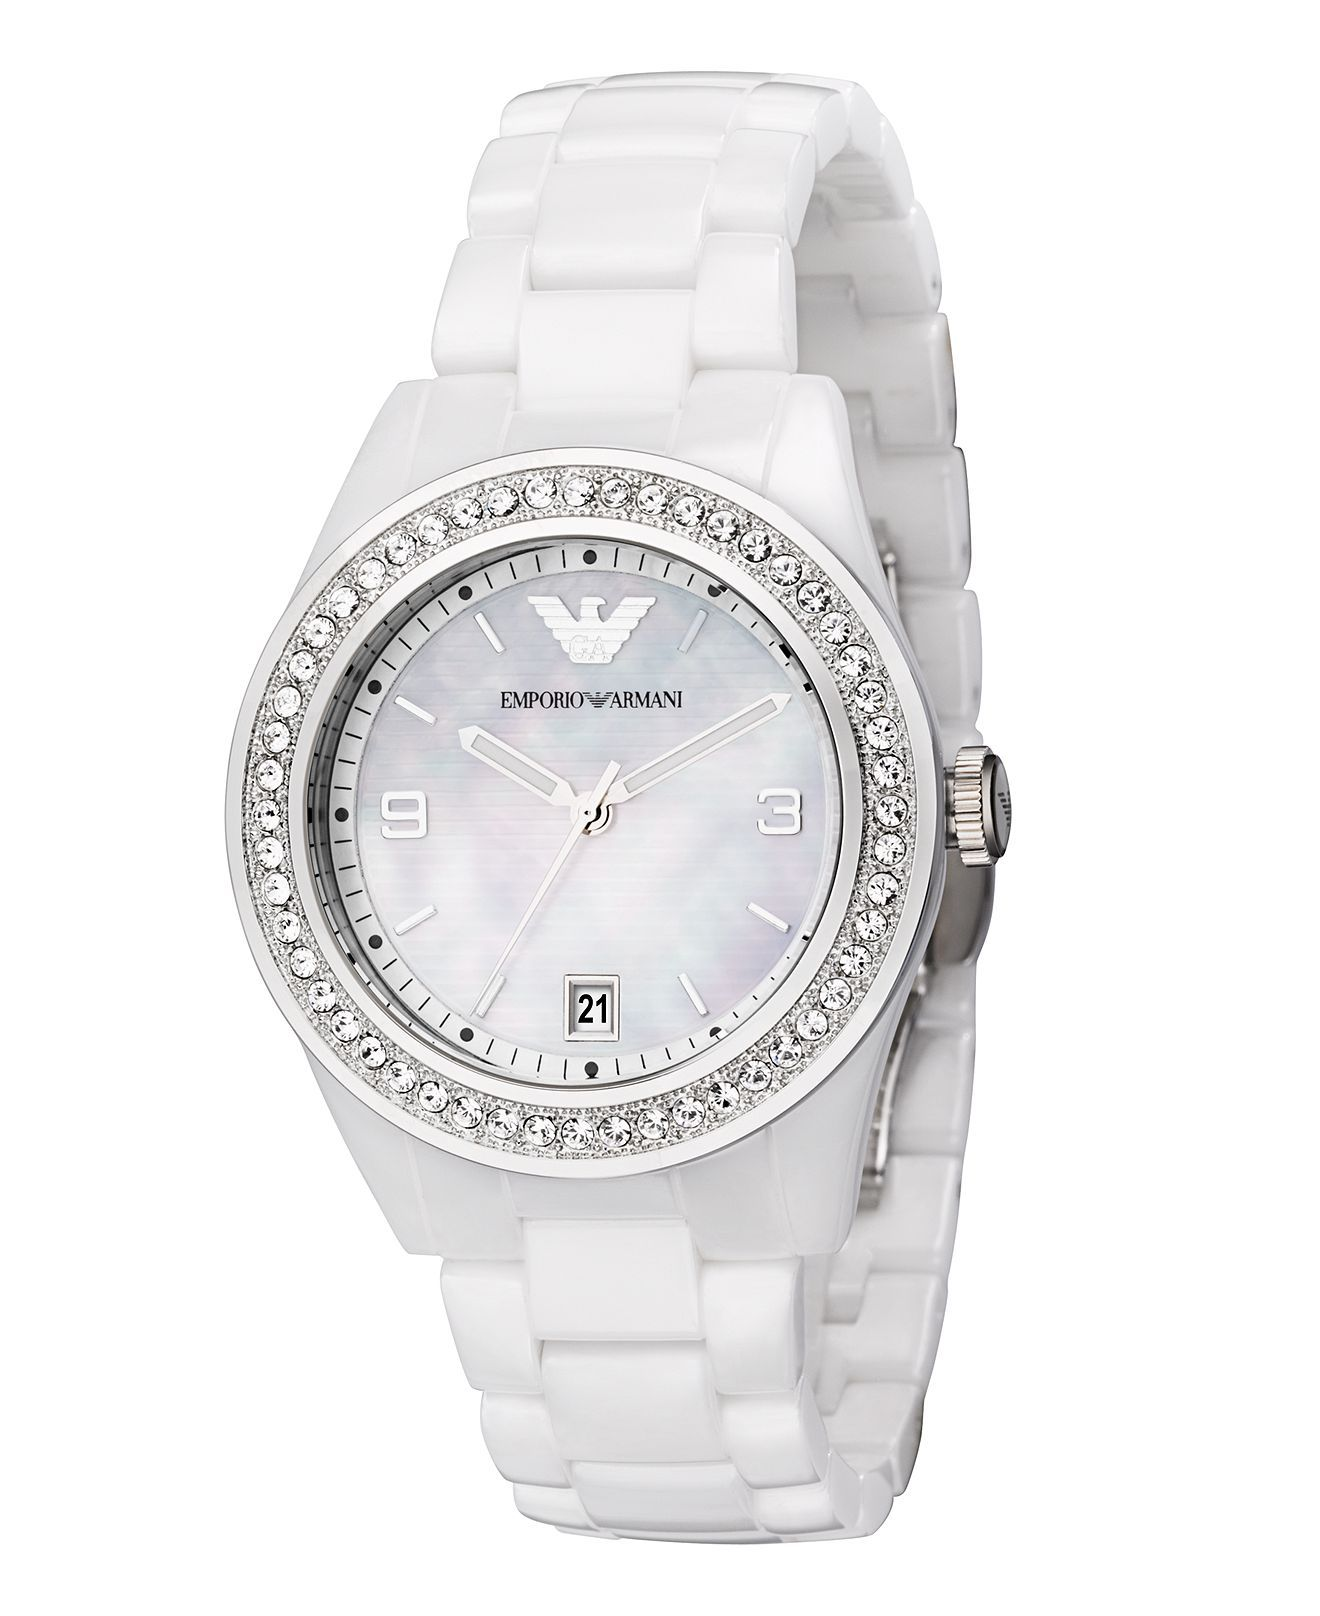 Emporio Armani Watch Women S White Ceramic Bracelet Ar1426 Women S Watches Jewelry Watches Crystal Watches Bracelet Watch Emporio Armani Ladies Watches